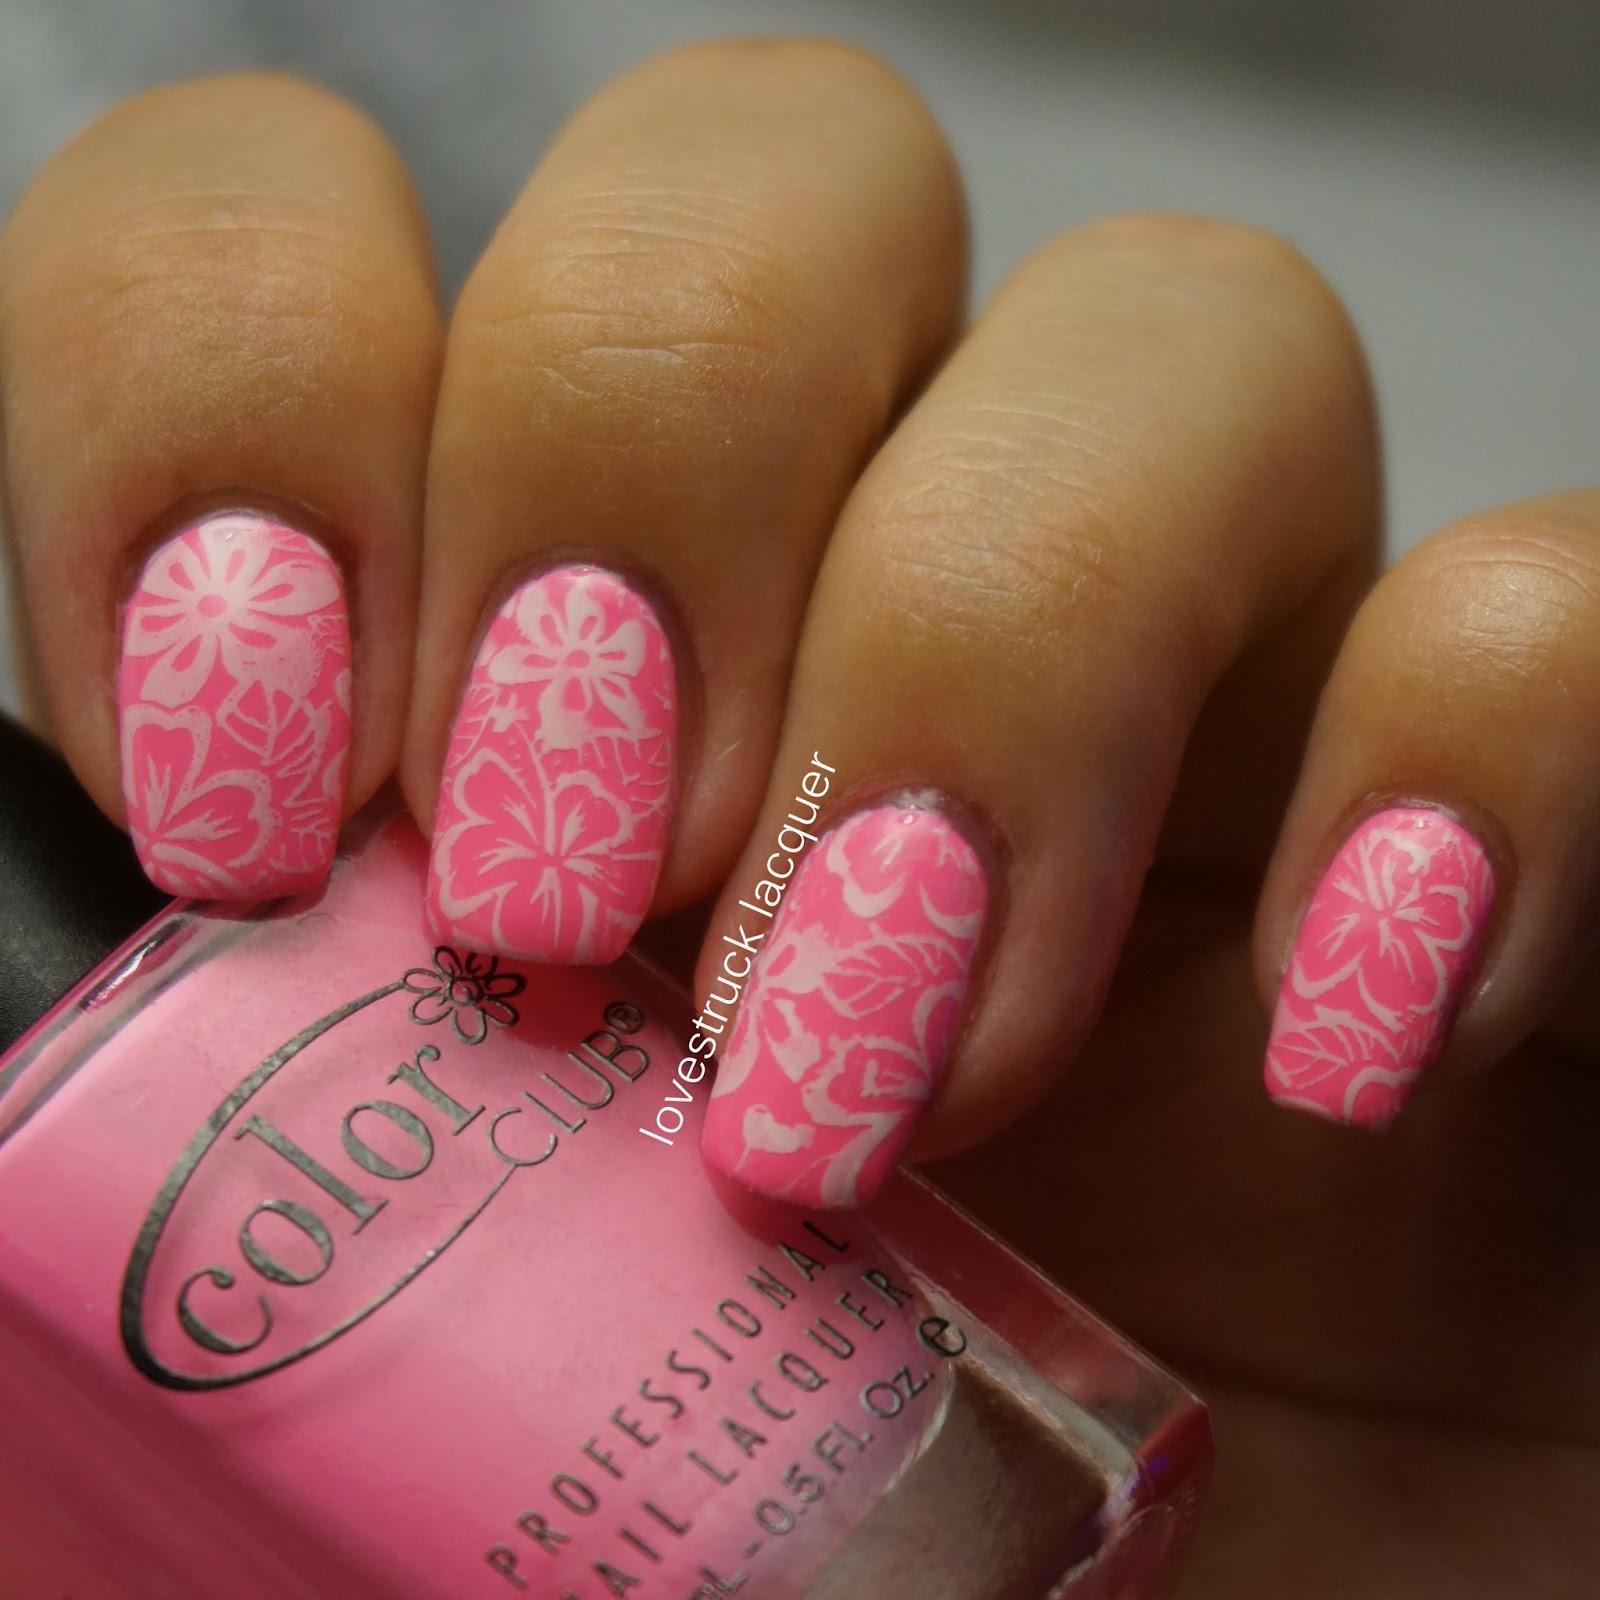 ... Roxy Inspired Nails for Nail Polish Canada's Summer Nail Art Challenge